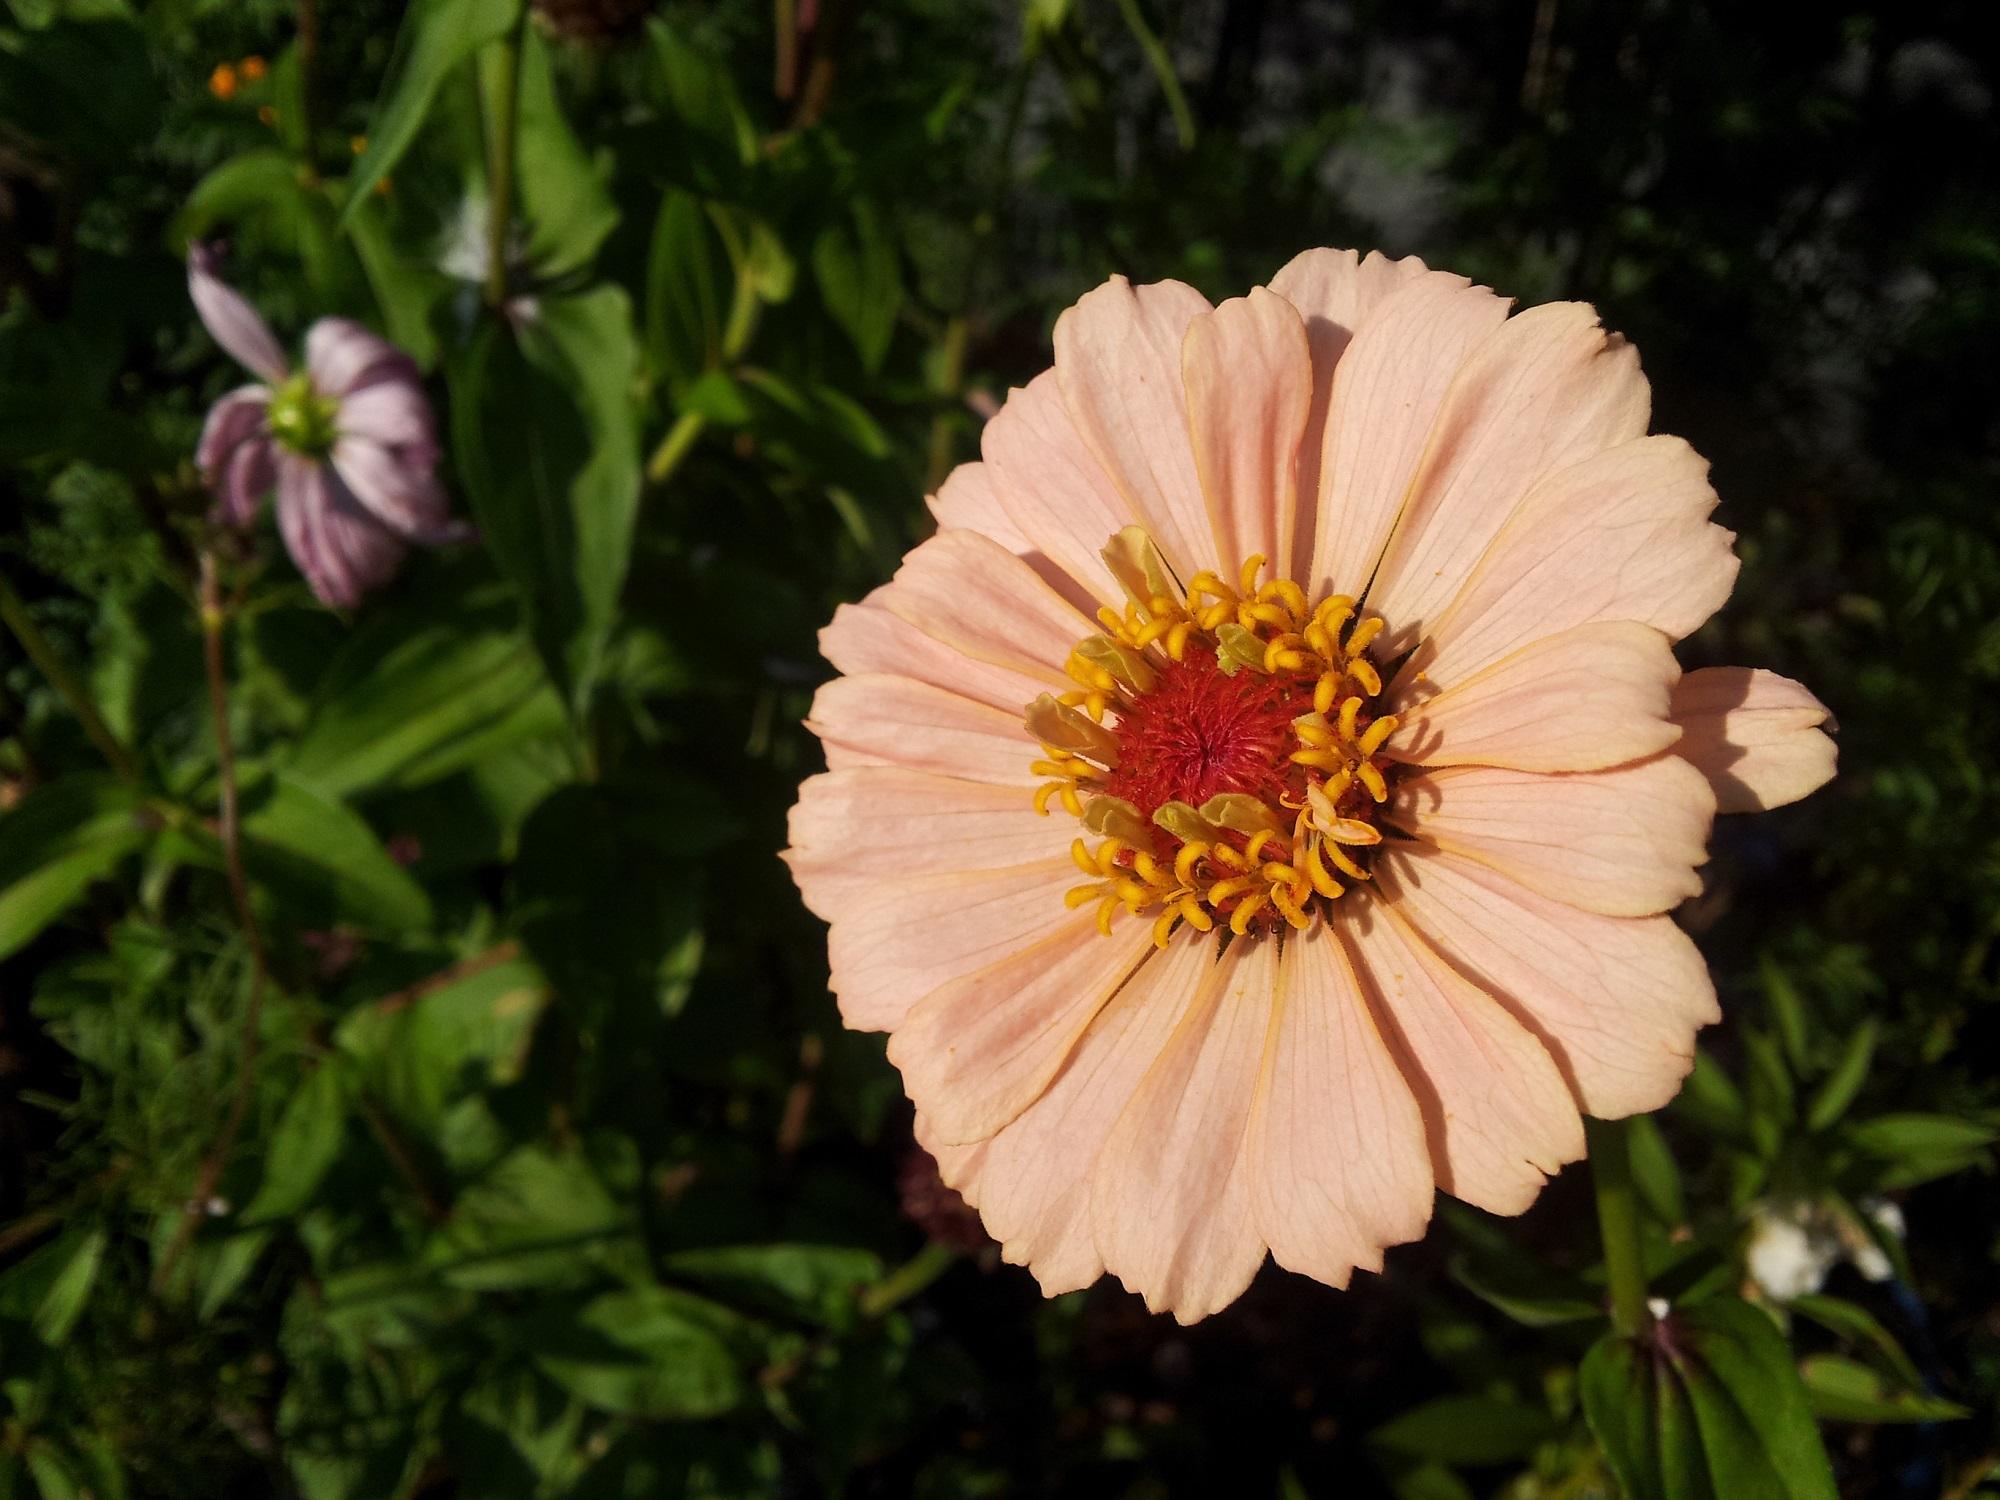 Fondos De Pantalla Romanticas Flores Buscar Pareja Estable